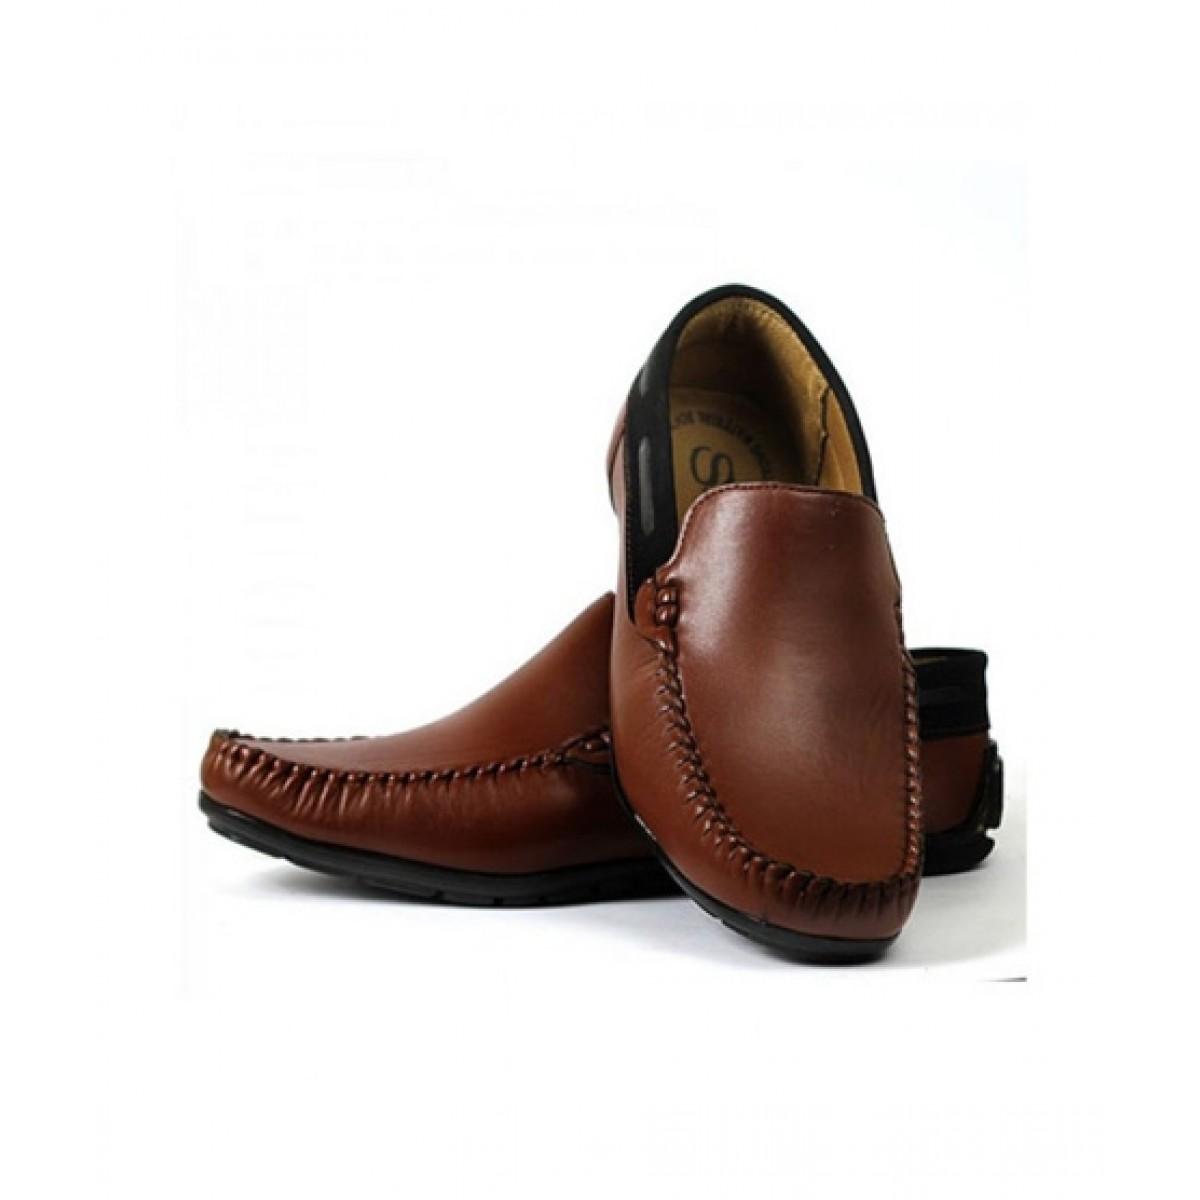 53f7b00487c PIP Kashish Loafers For Men s Brown Price in Pakistan